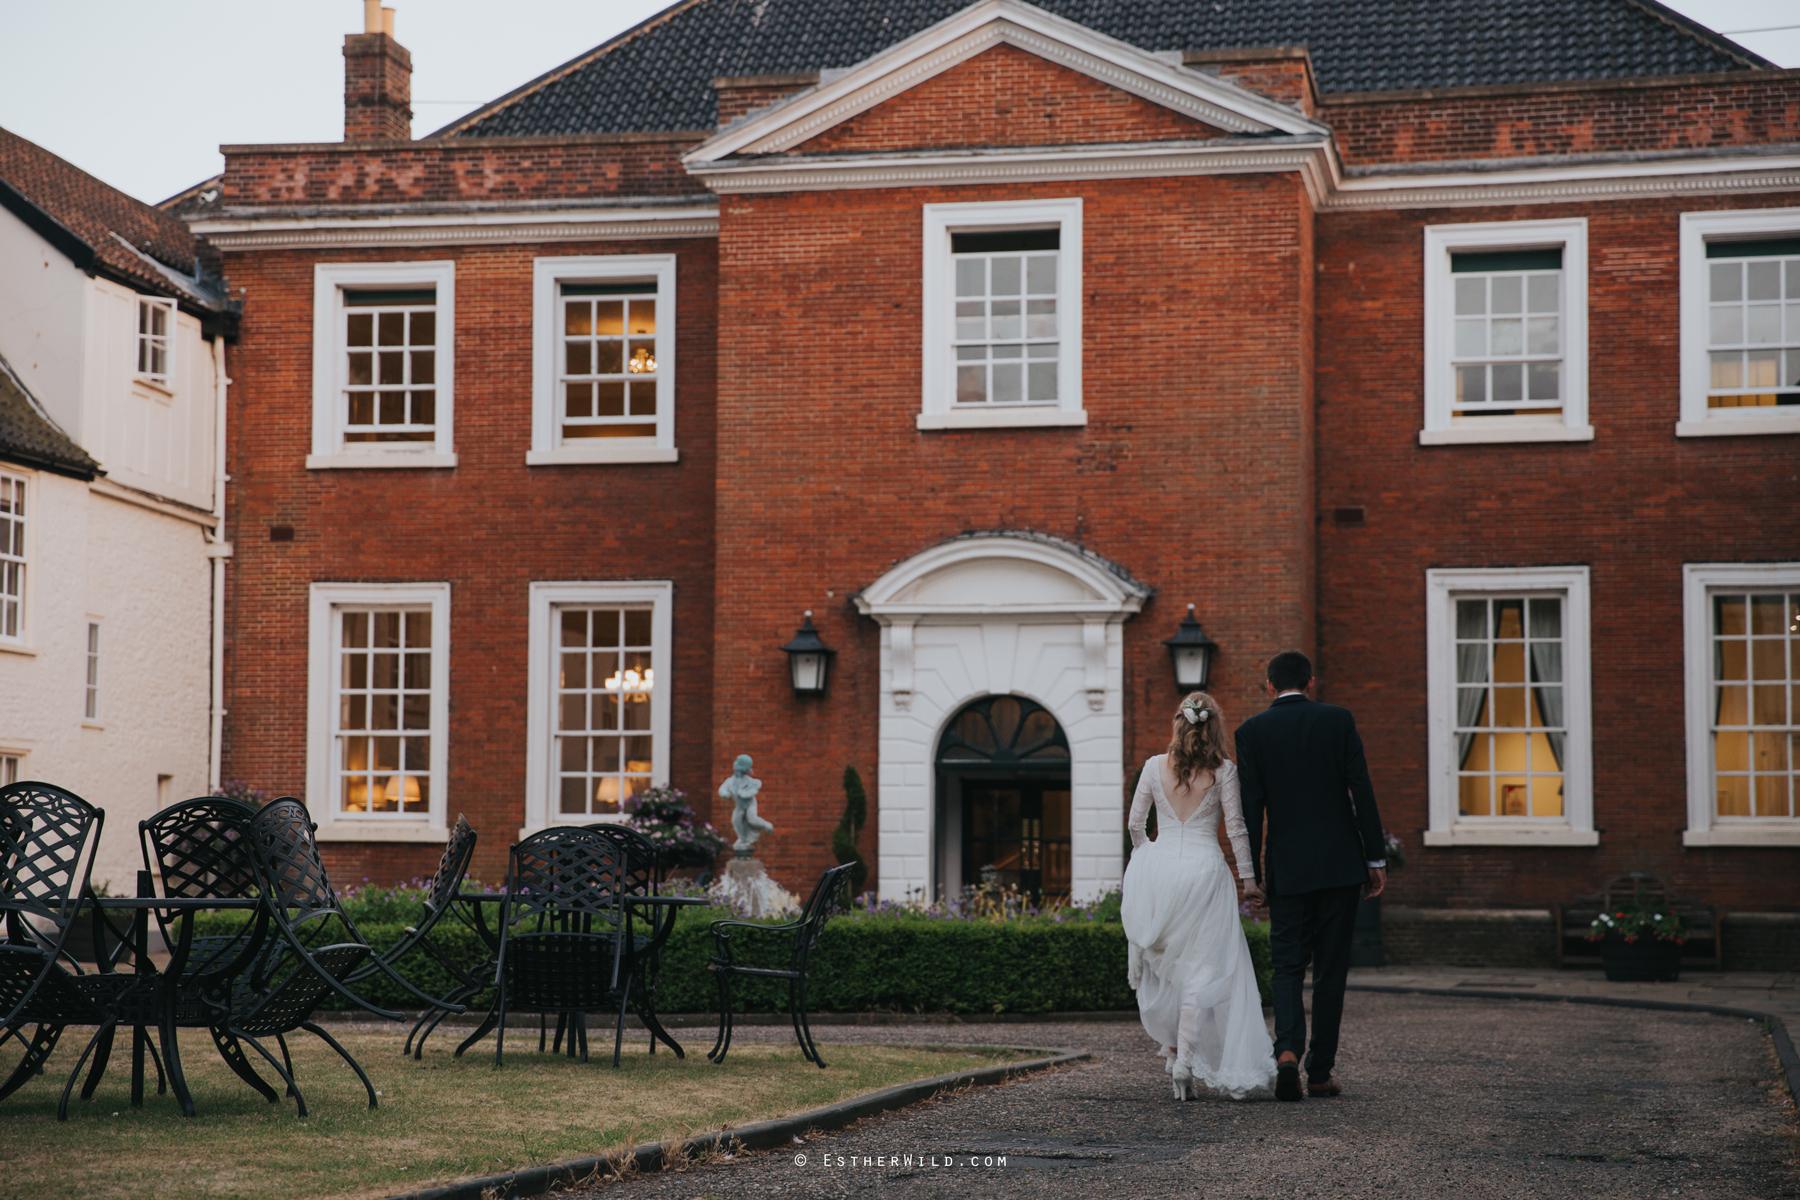 Norwich_Castle_Assembly_House_Norwich_Norfolk_Esther_Wild_Photographer_IMG_2092.jpg